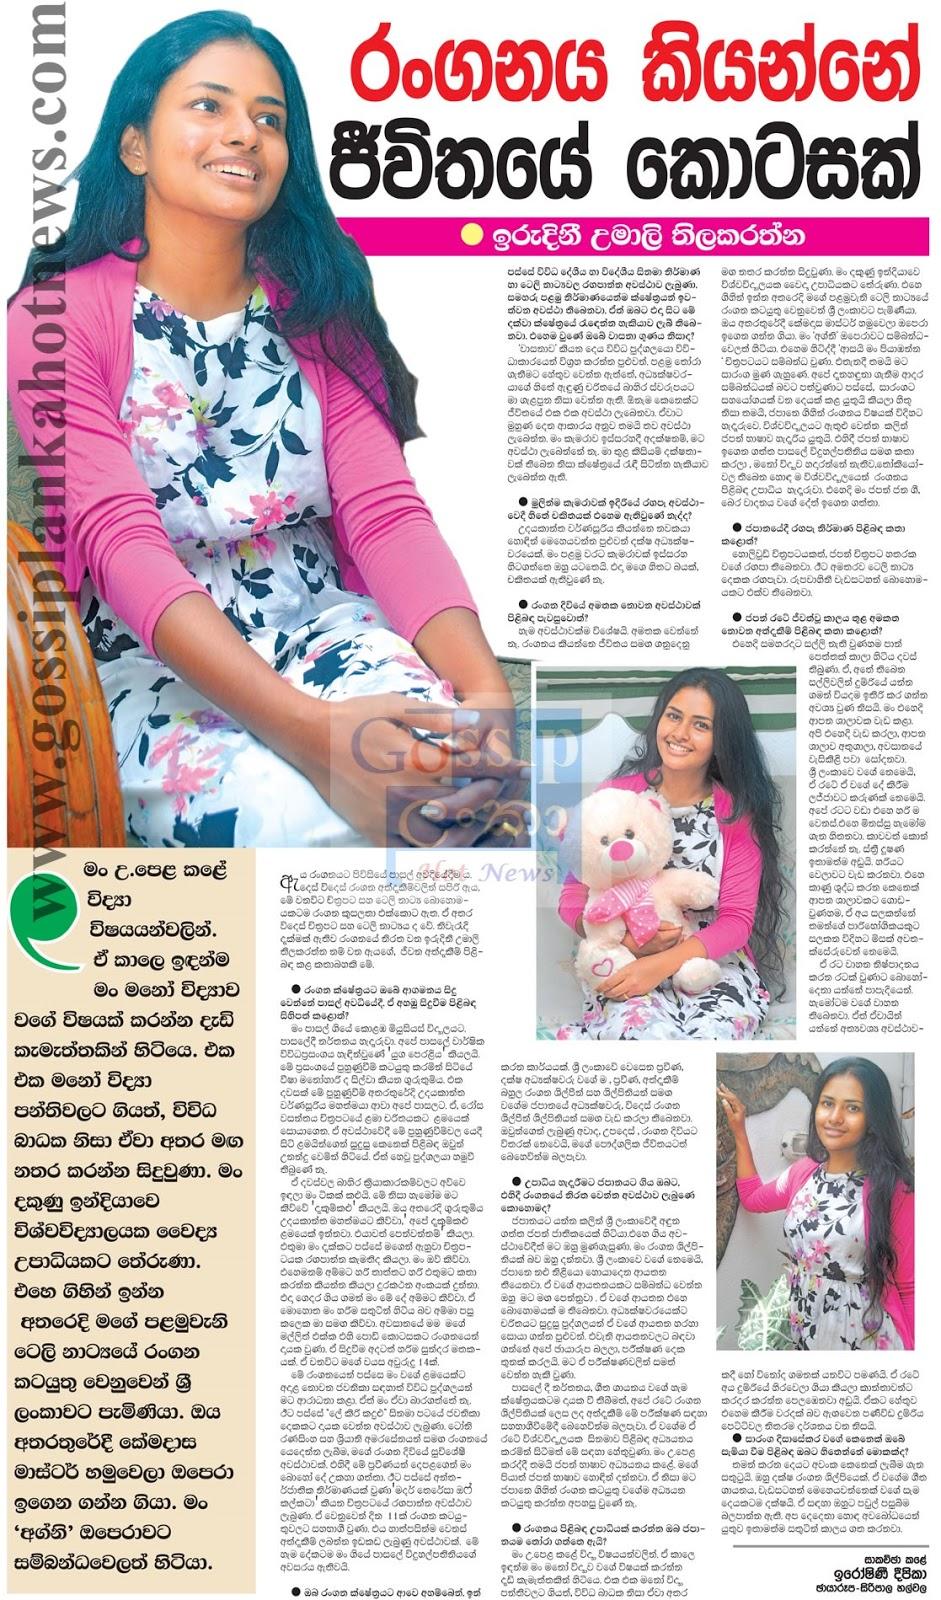 Gossip Chat With Umali Thilakaratne